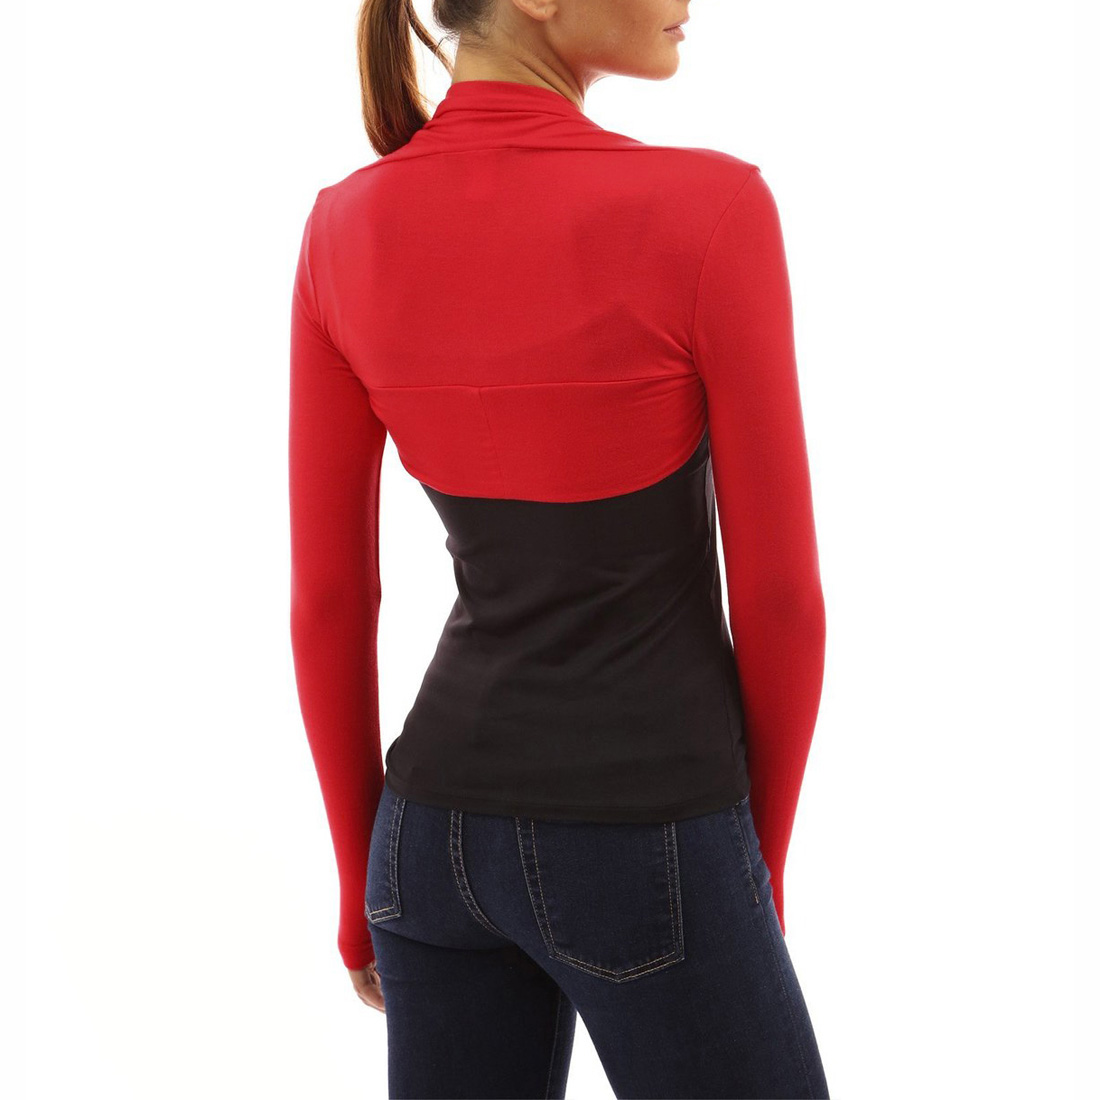 5b104d9902 Womens Plain Long Sleeves Cardigans Bolero Shrug Cropped Cardigan ...